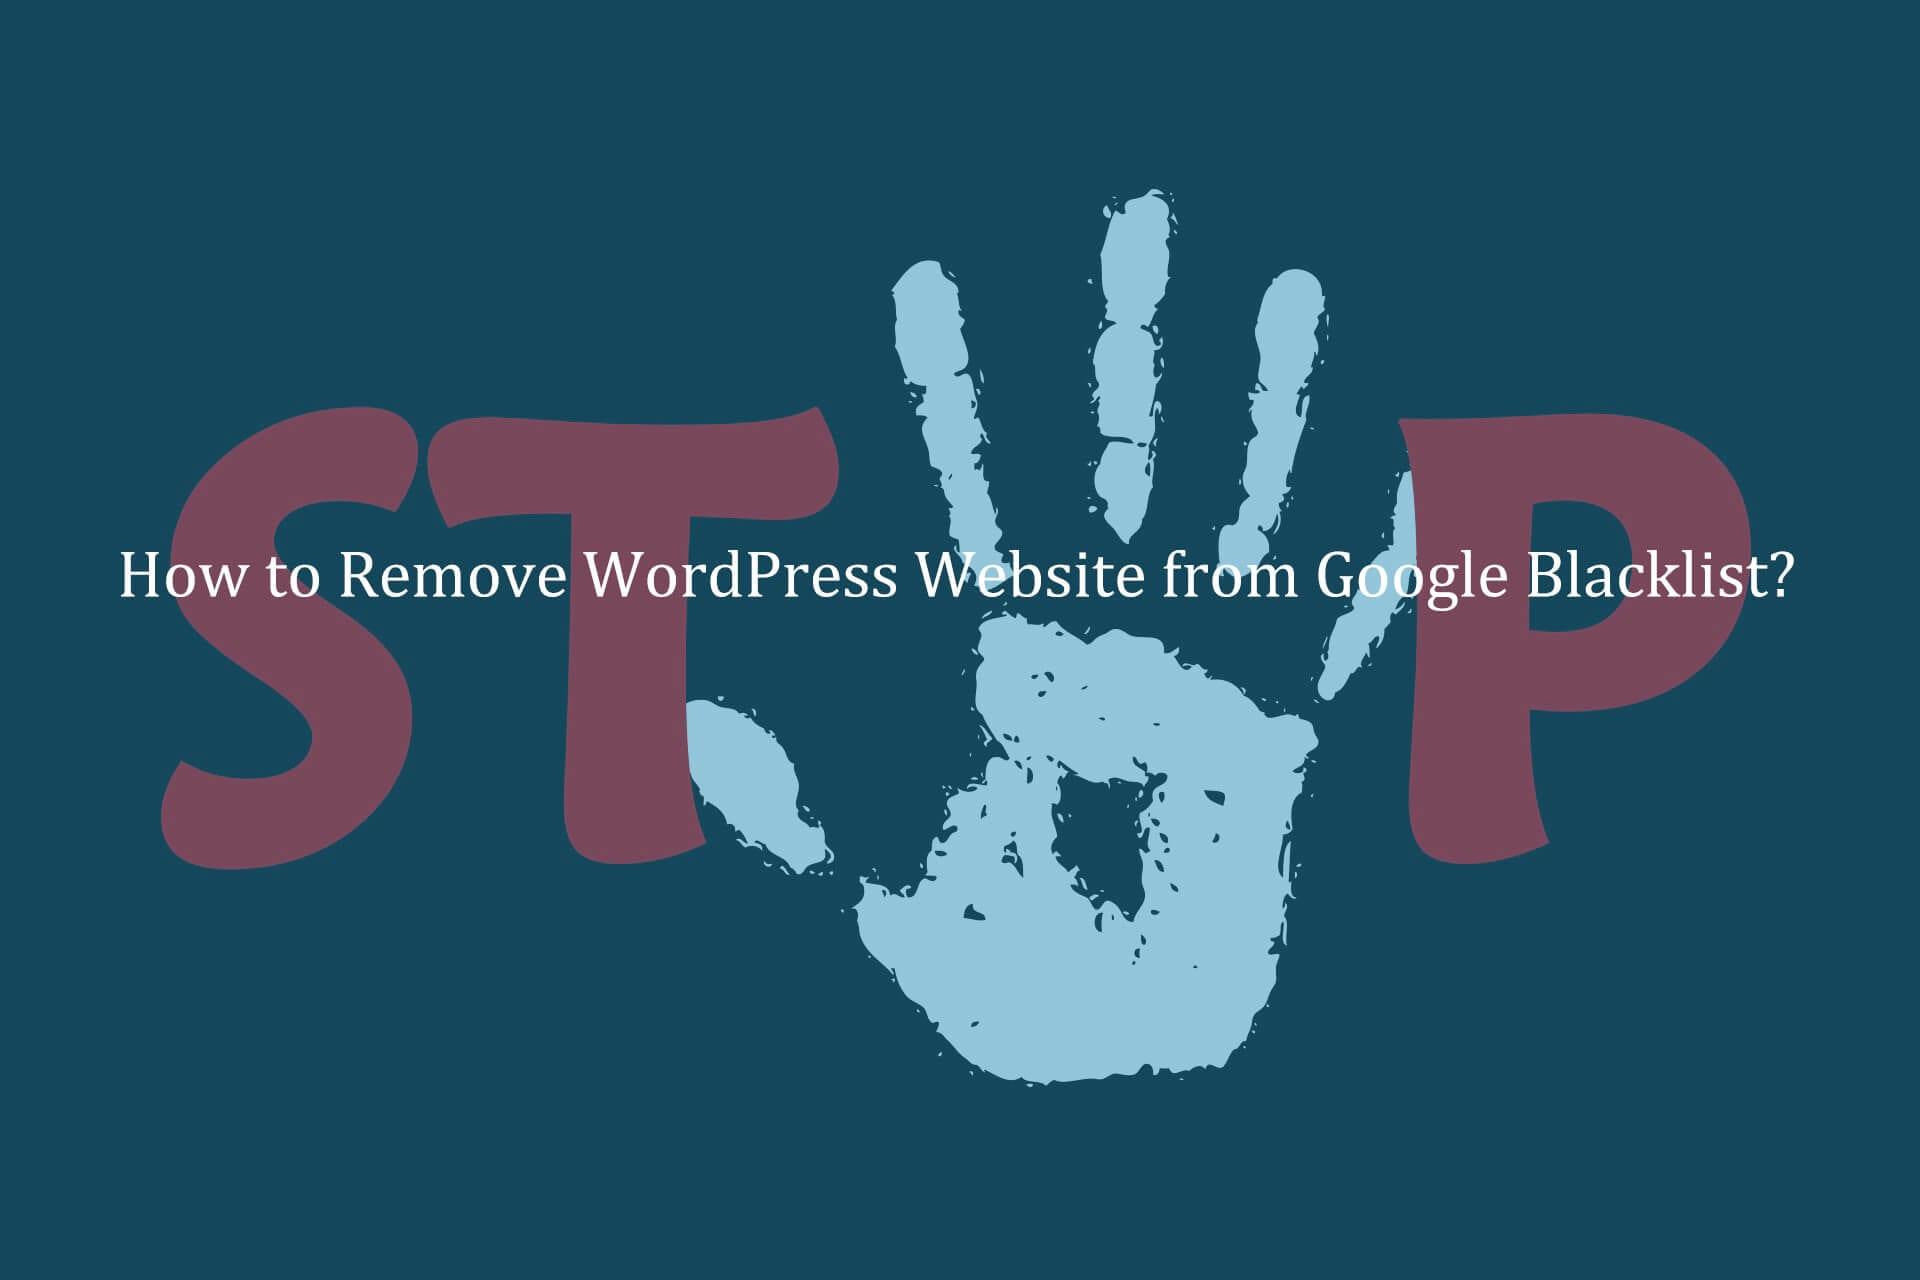 How_to_Remove_WordPress_Website_from_Google_Blacklist